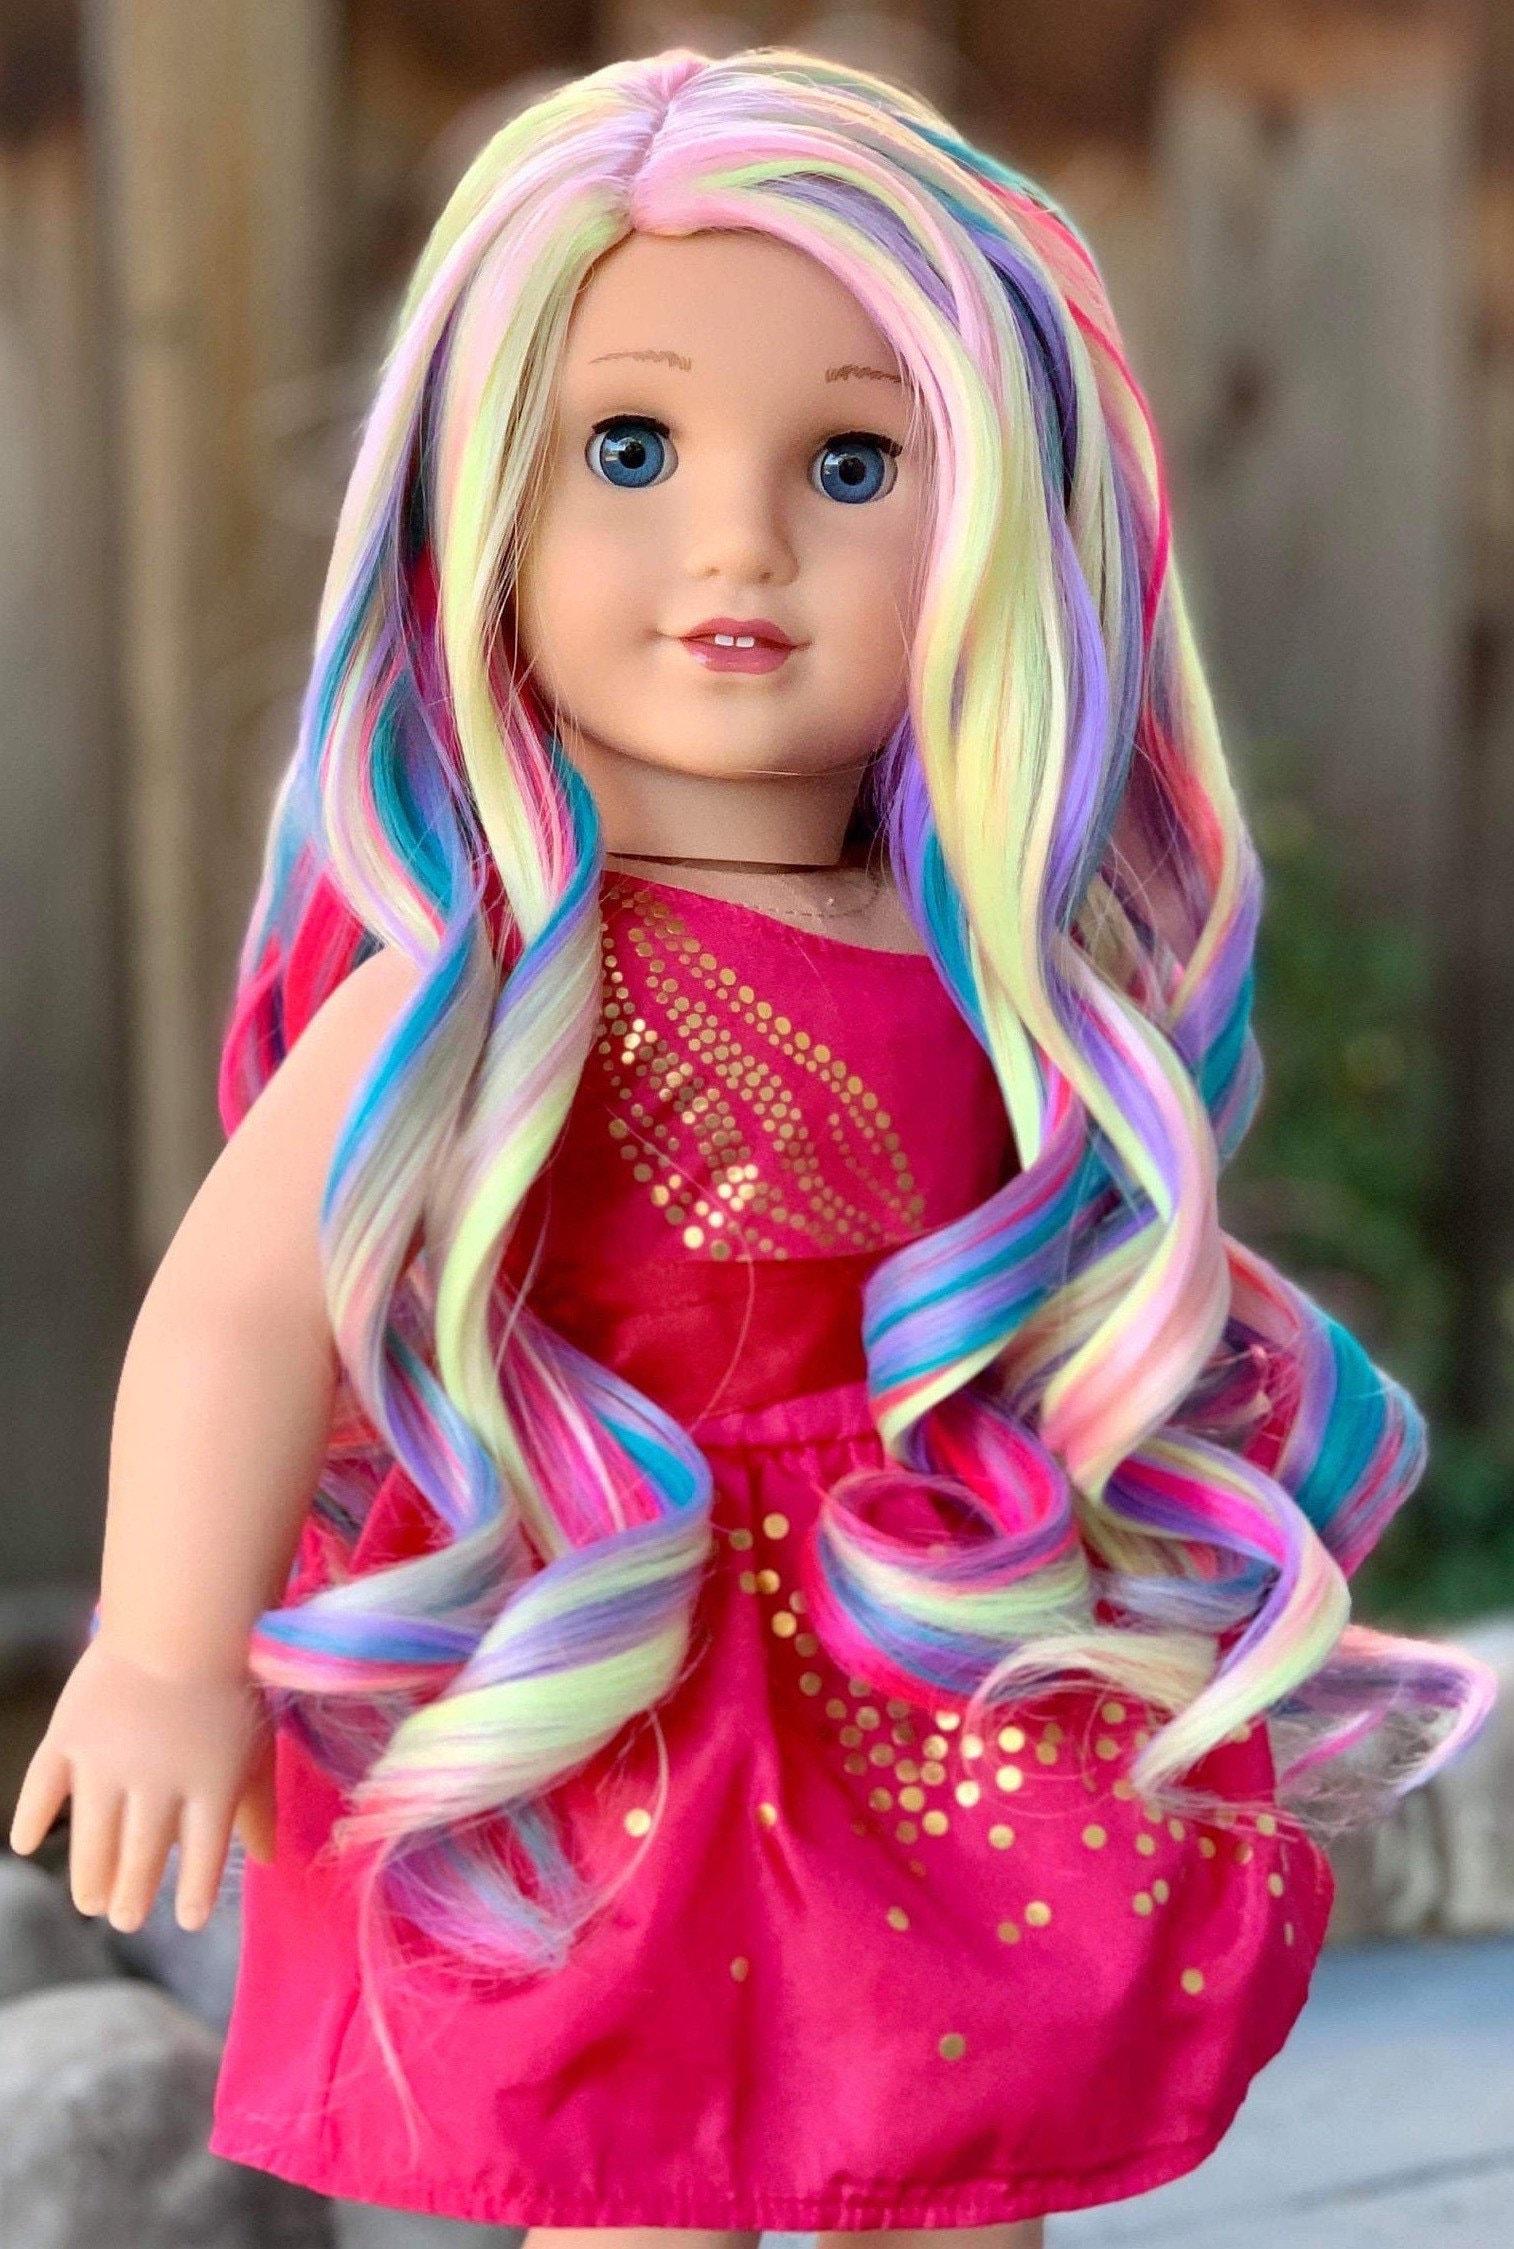 #1 Doll Wig cap 10-11  Fits American Girl Madame Alexander